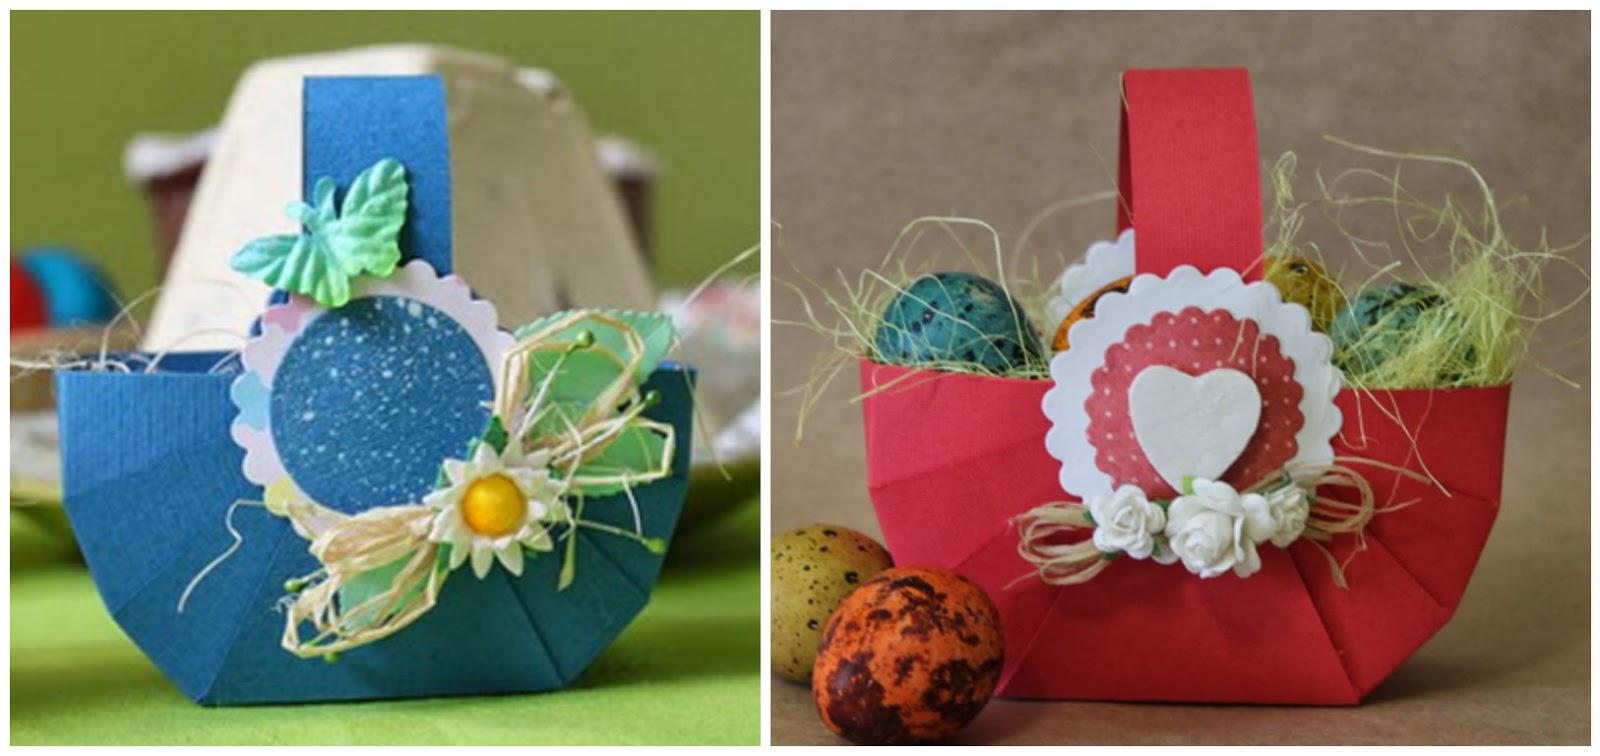 ESPECIAL DE PASCUA: Canastas para huevos de Pascua